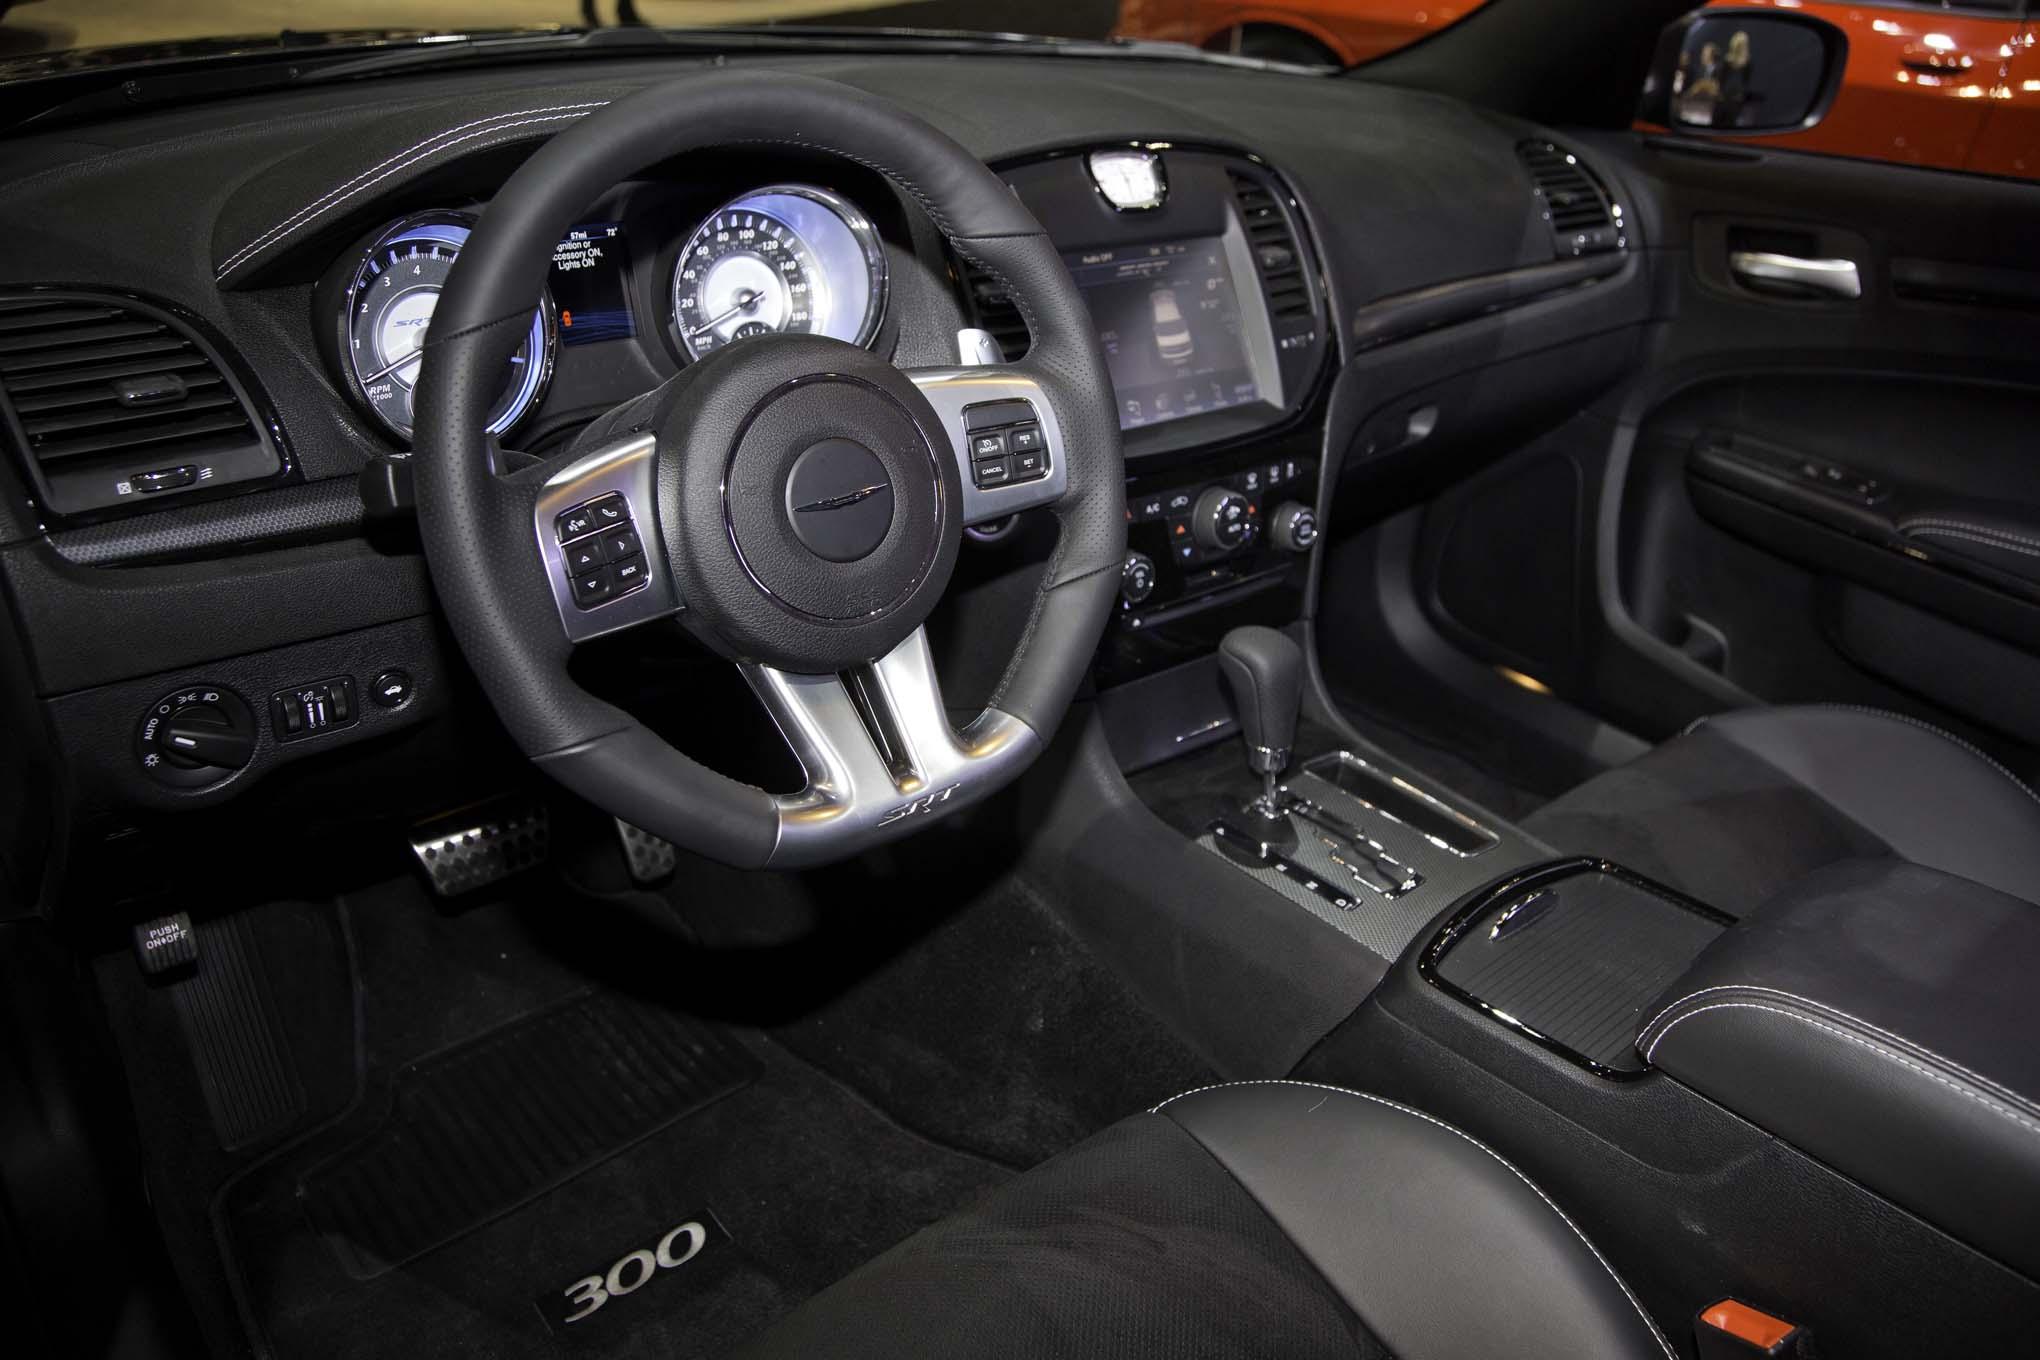 2014 chrysler 300 interior. 2014 chrysler 300 srt satin vapor edition interior 02